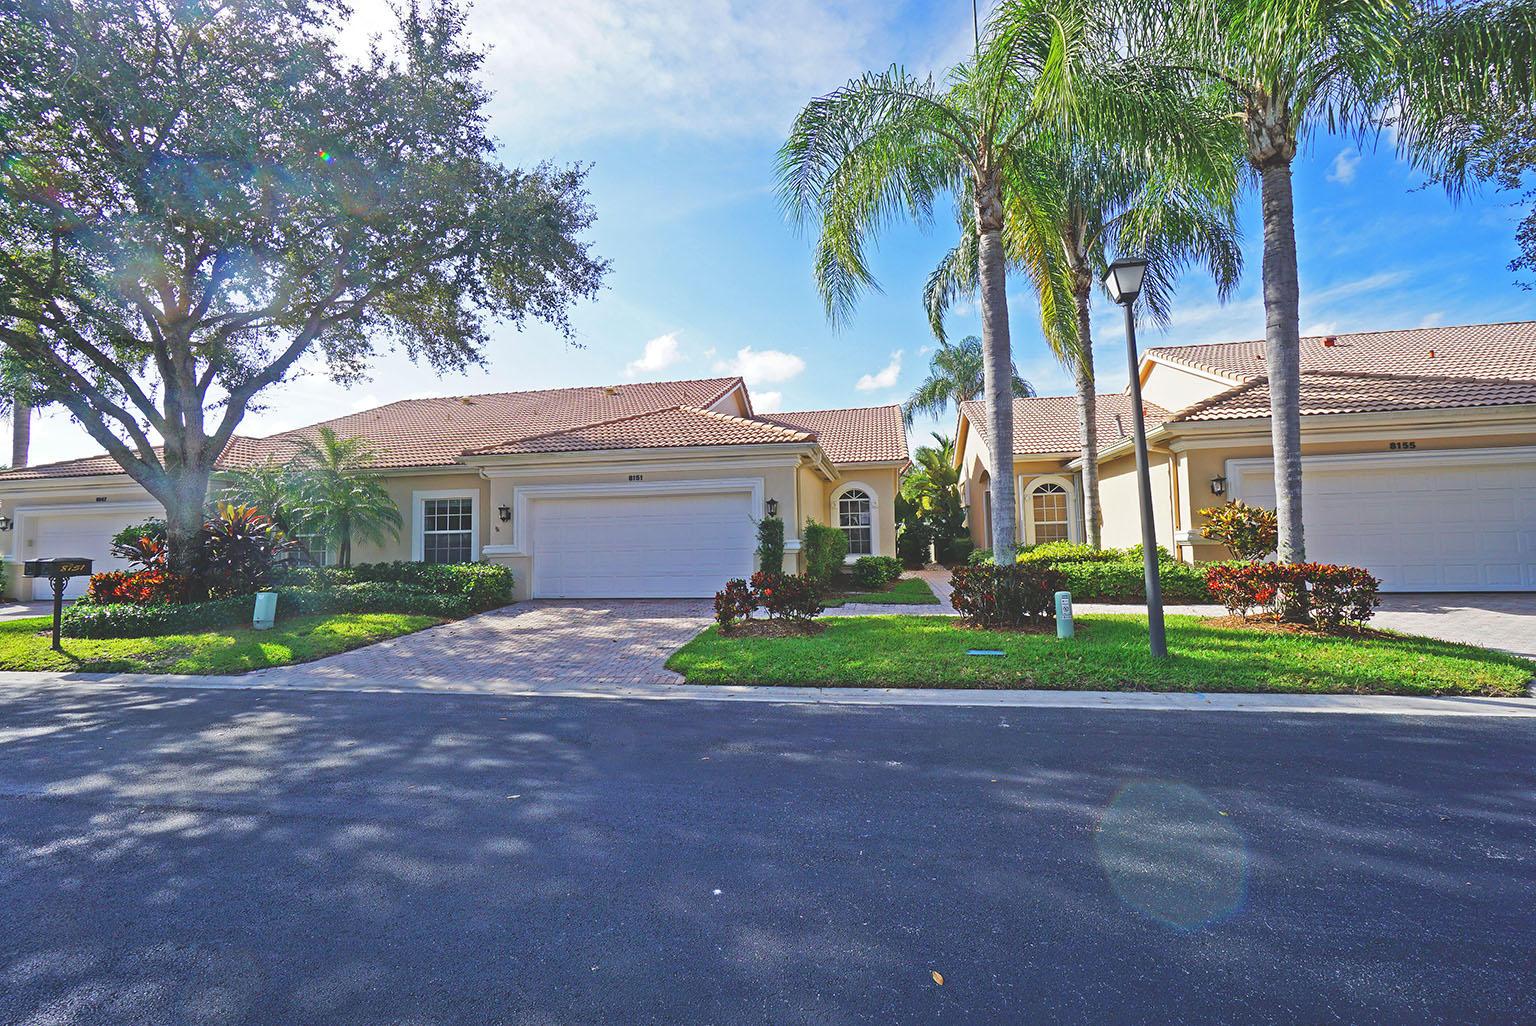 8151 Sandpiper Way 8151, West Palm Beach, Florida 33412, 3 Bedrooms Bedrooms, ,2 BathroomsBathrooms,A,Villa,Sandpiper,RX-10588979